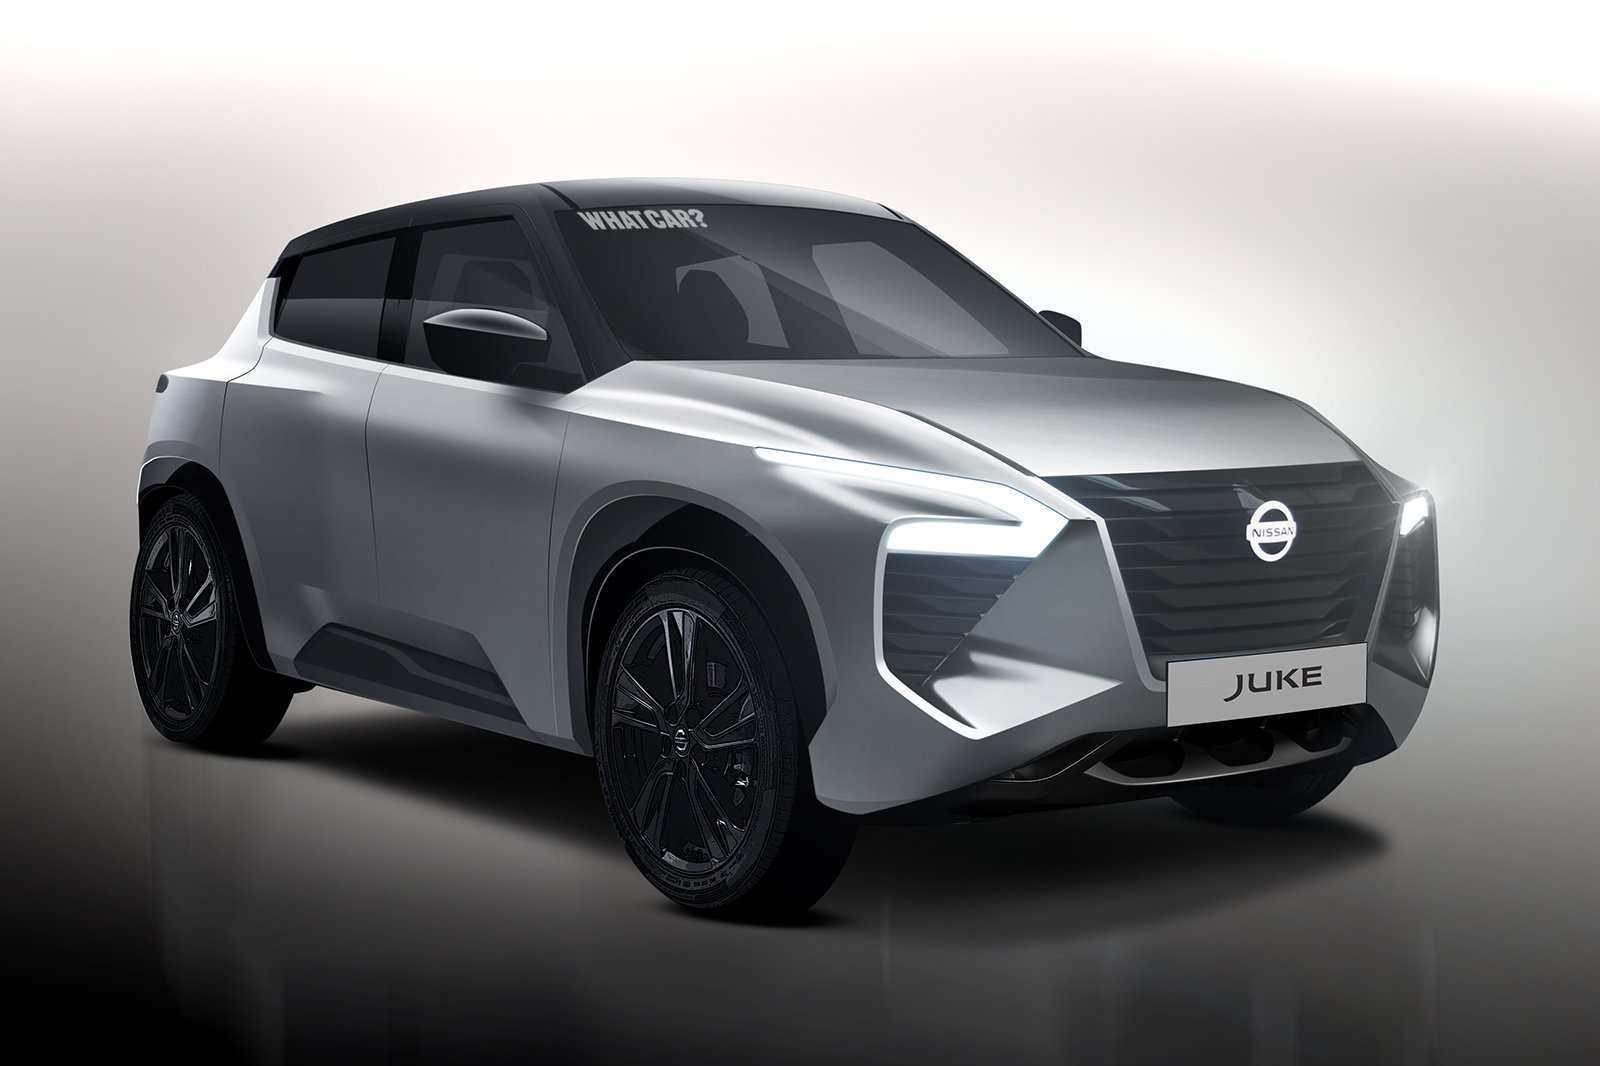 97 All New Nissan Juke 2019 Release Date Specs by Nissan Juke 2019 Release Date